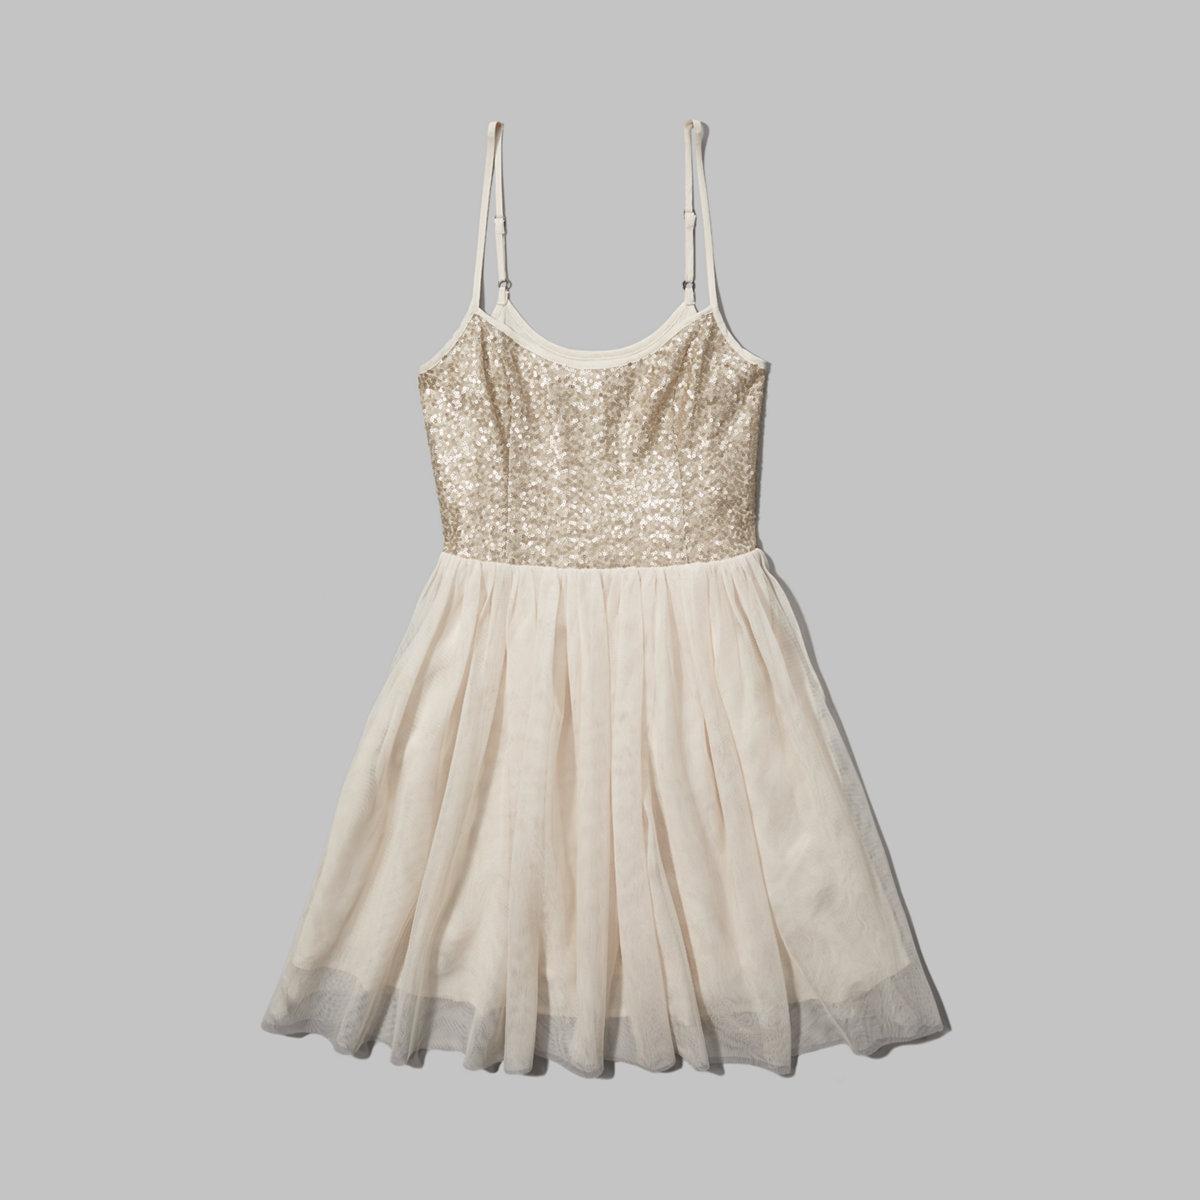 Mary Shine Tutu Dress